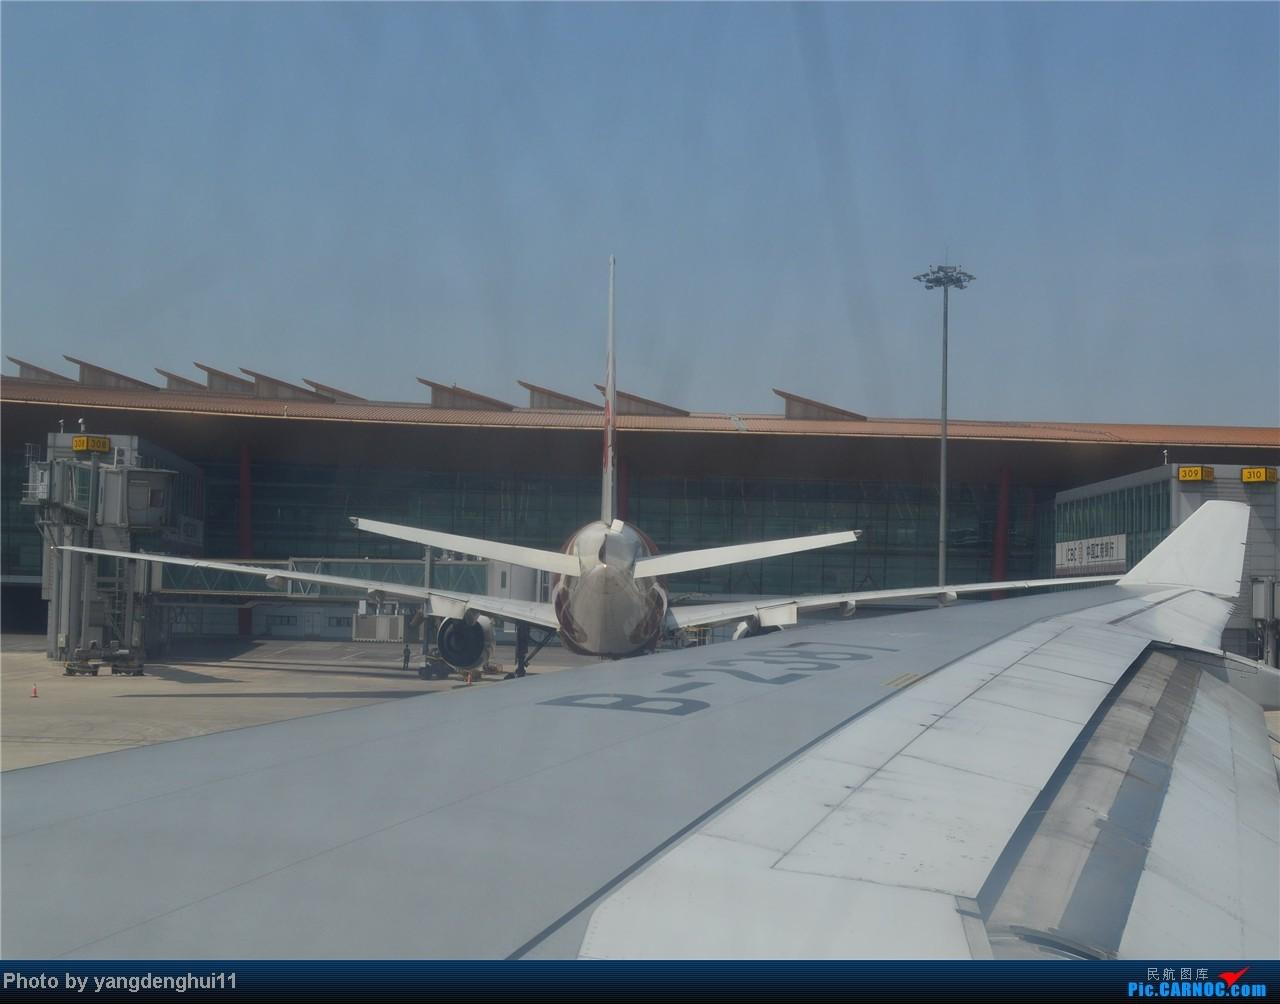 Re:[原创]暑假出游:CTU---PEK---CTU,北京巧遇国航红、蓝凤凰。(上) BOEING 777-200 B-2060 中国北京首都机场